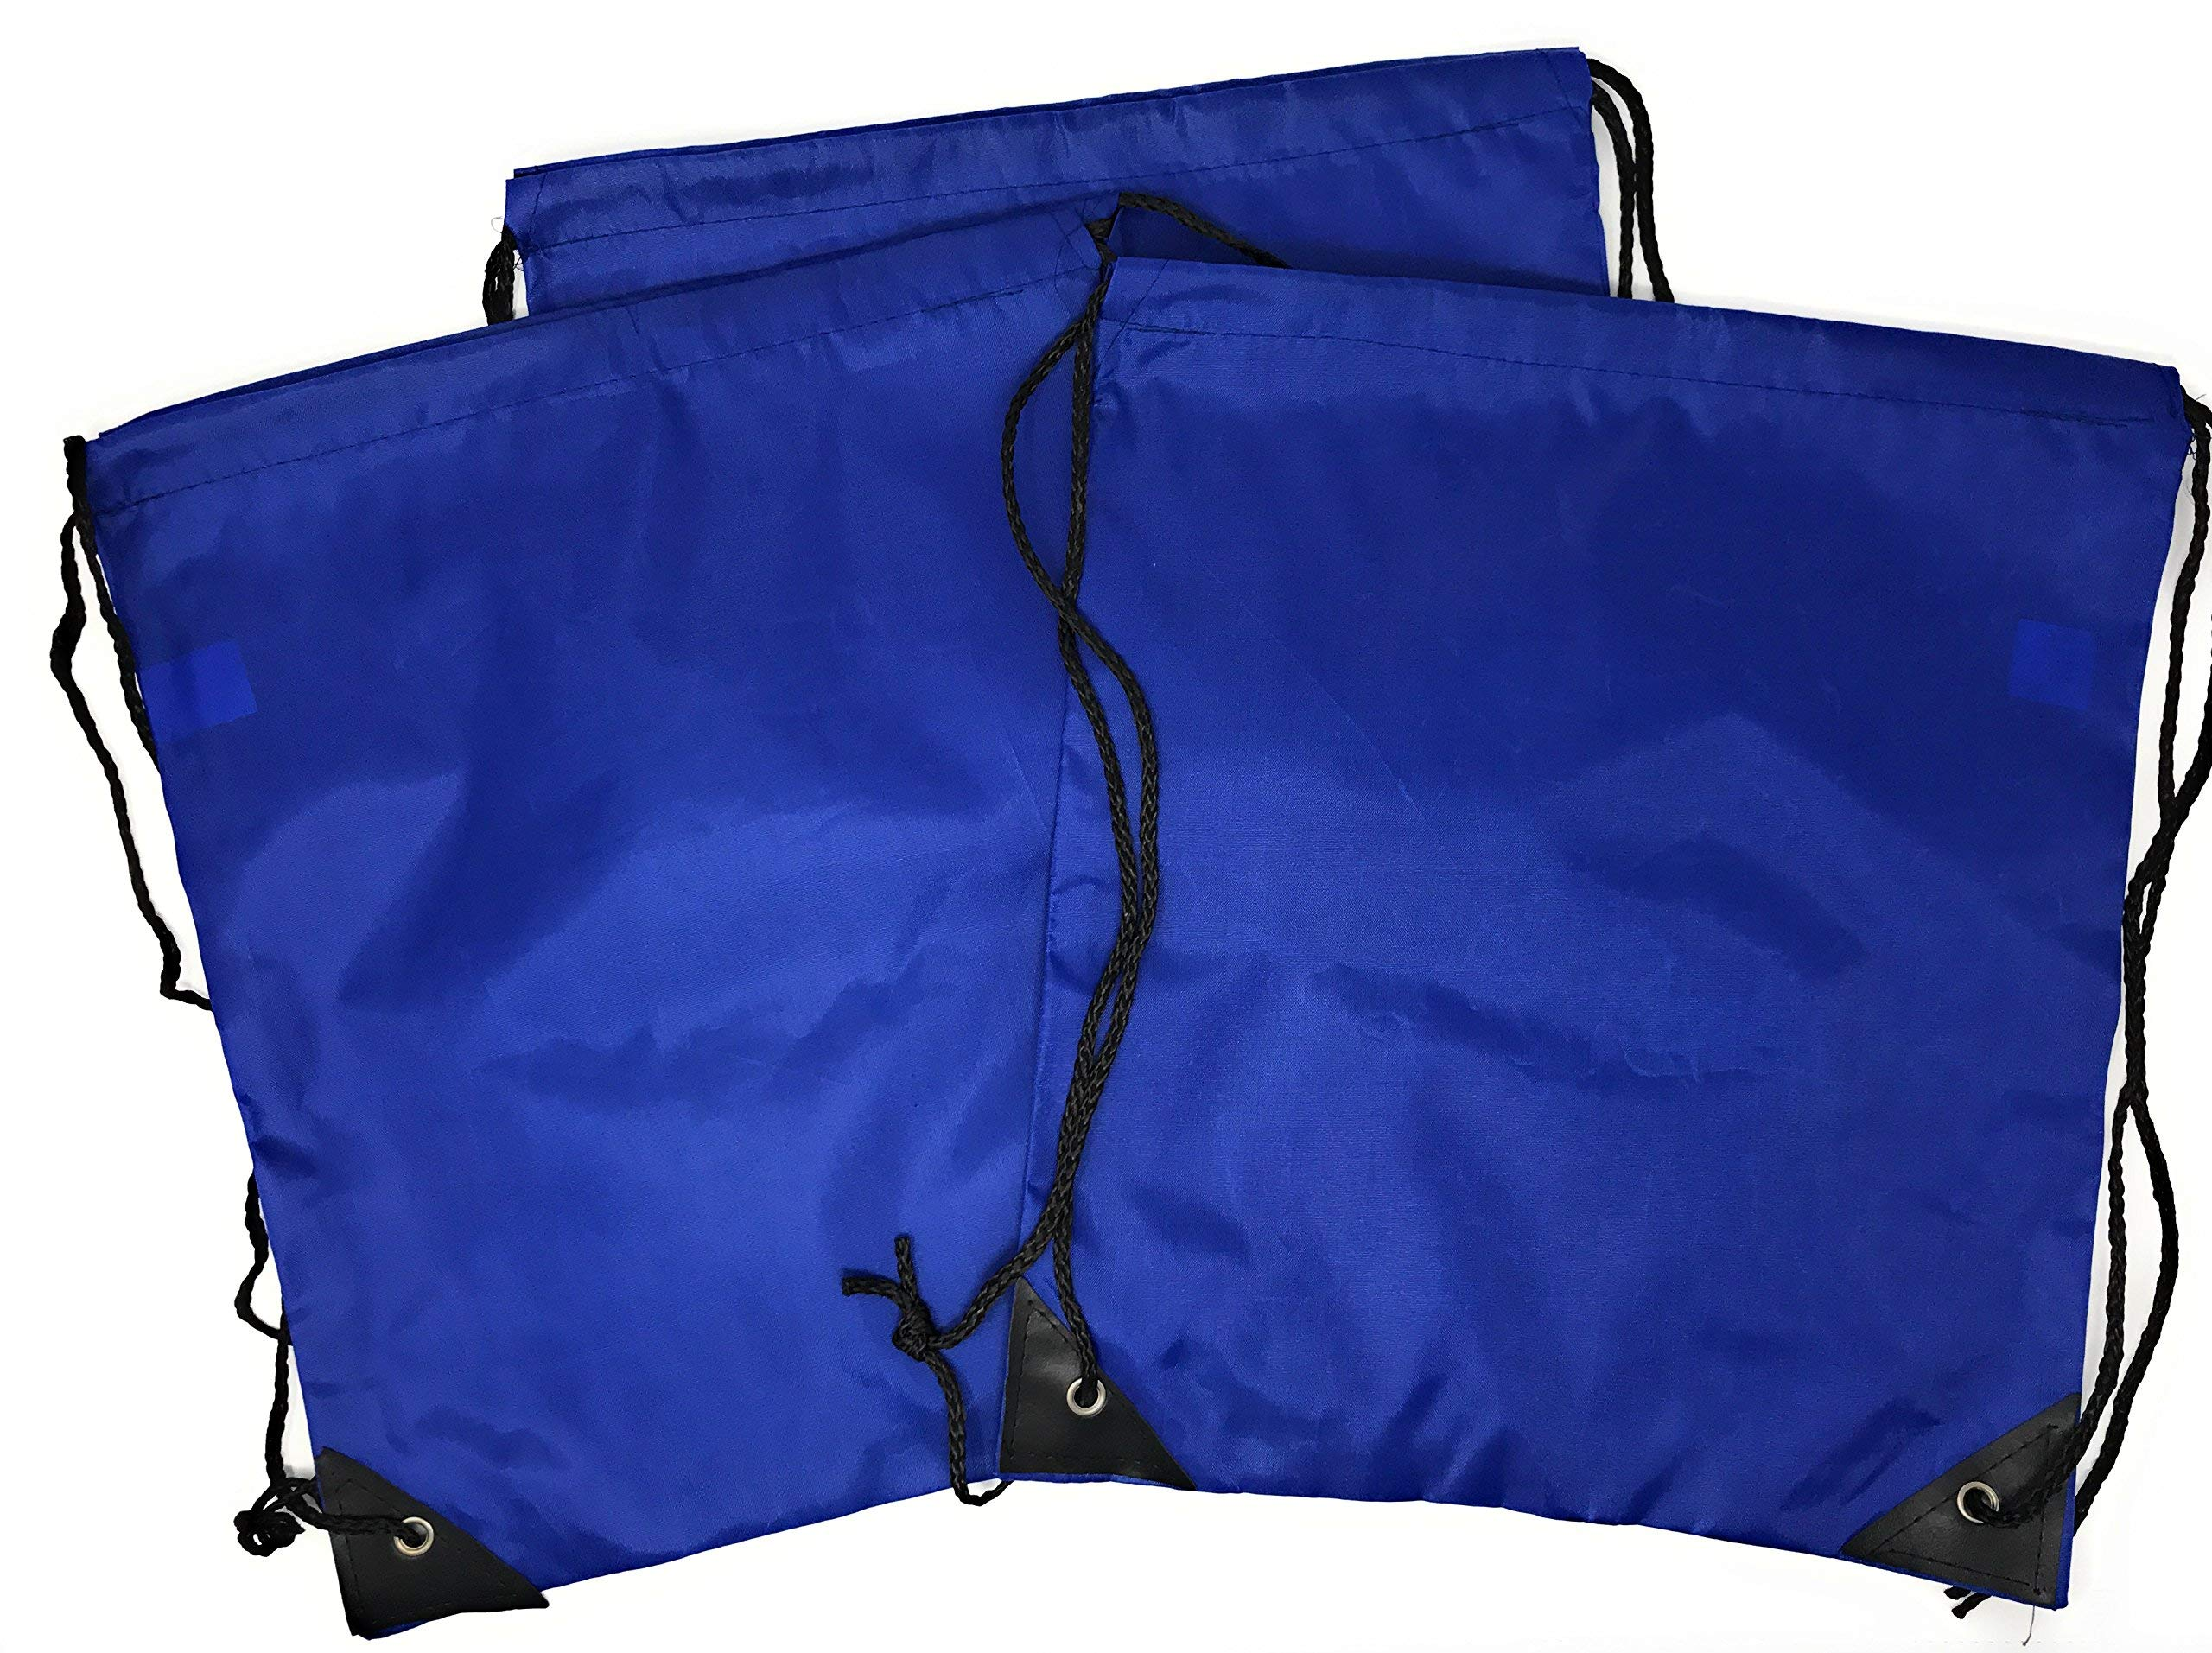 Bulk 20 Pack of Drawstring Backpacks - Sports Bag Cinch Sack (Blue)